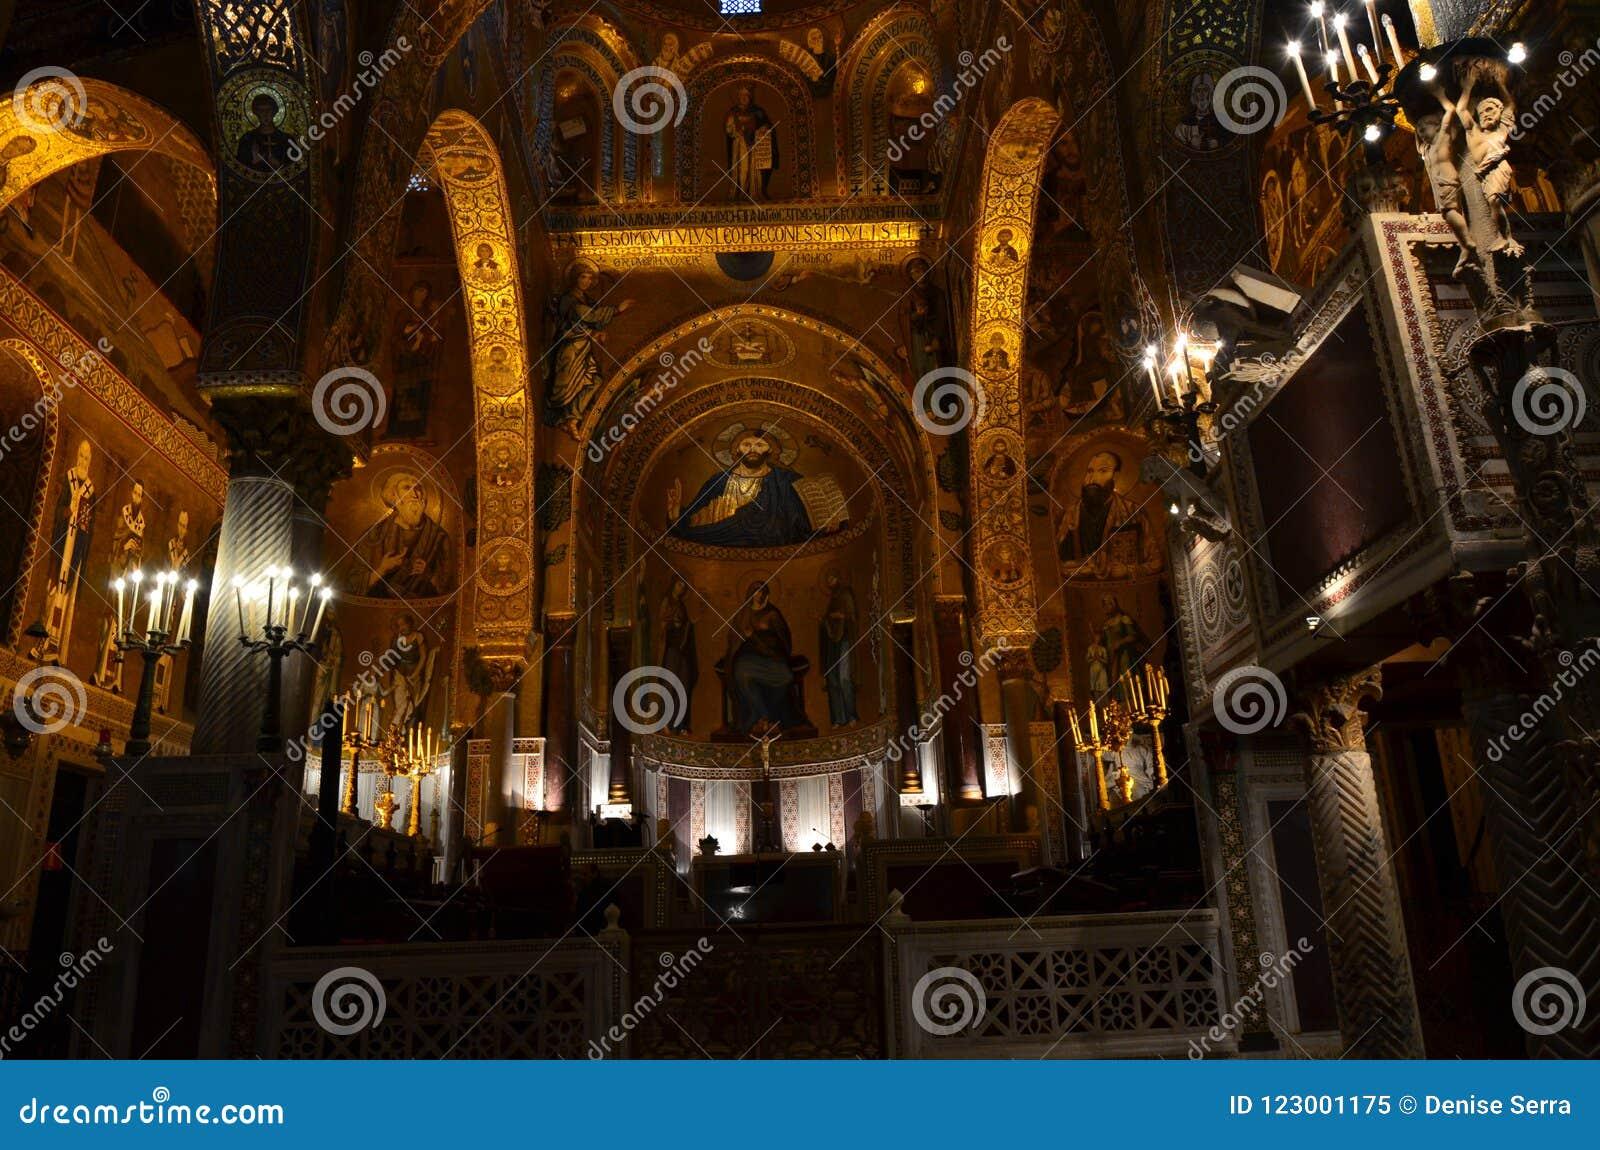 Interior of the Capella Palatina in Palazzo dei Normanni Norman Palace - Palermo - Sicily - Italy